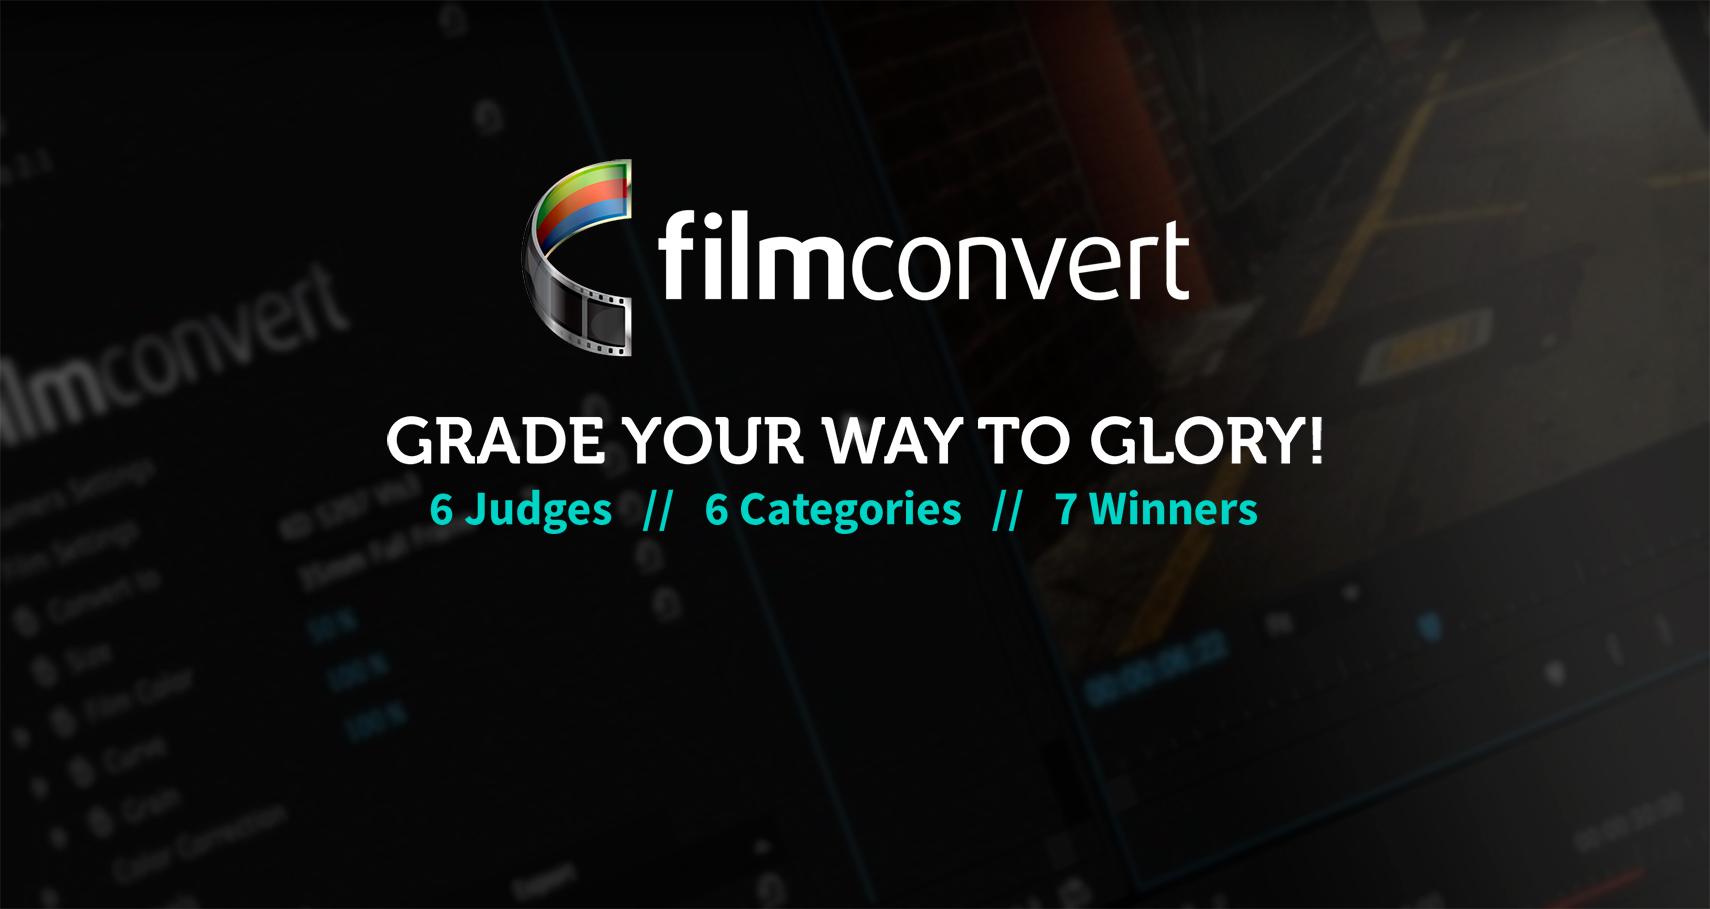 FilmConvertが2017年度カラーアップコンペを開催